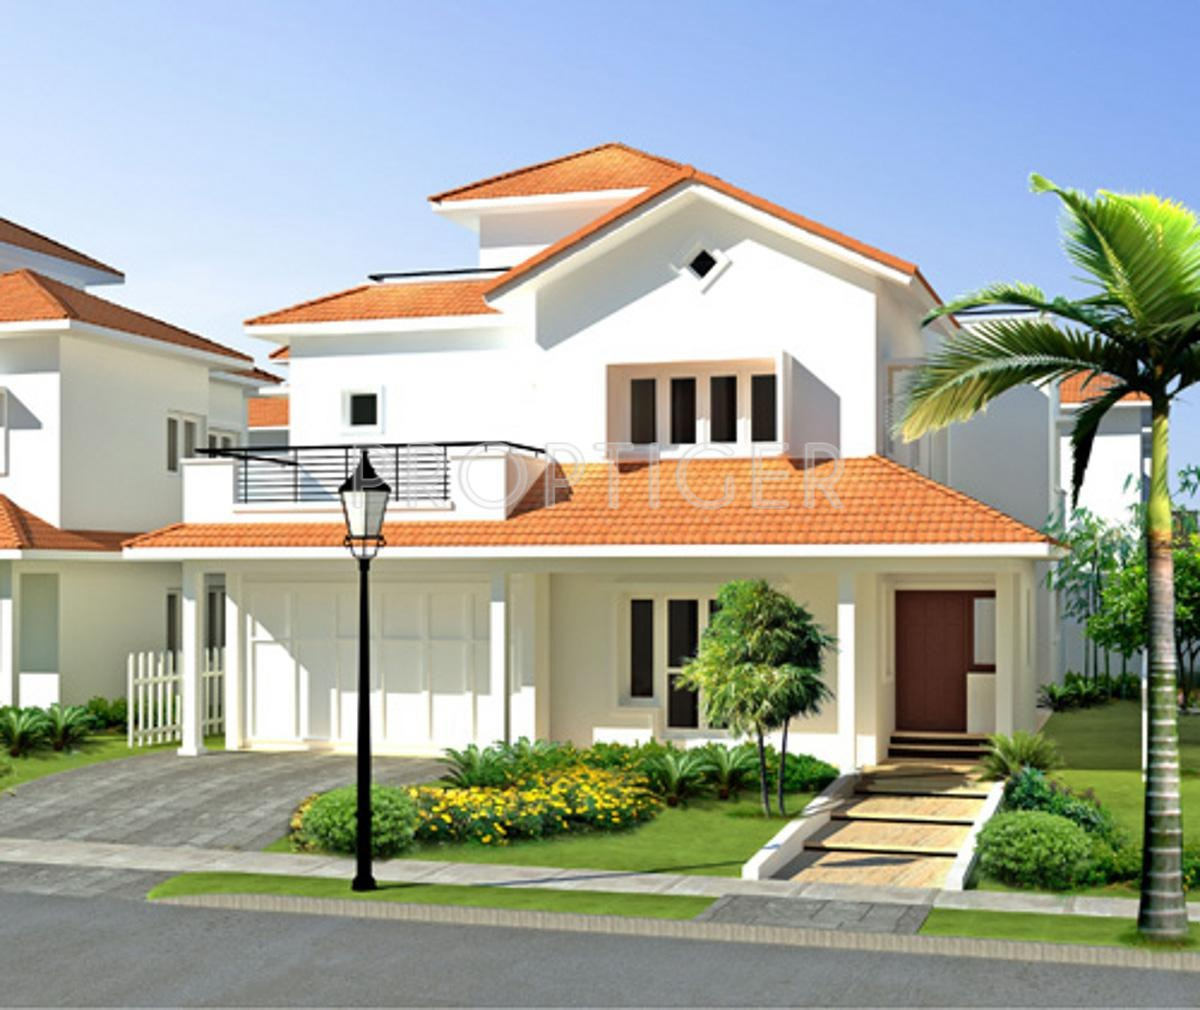 Villa S Interior Design 12: Adarsh Palm Retreat Villas In Bellandur, Bangalore